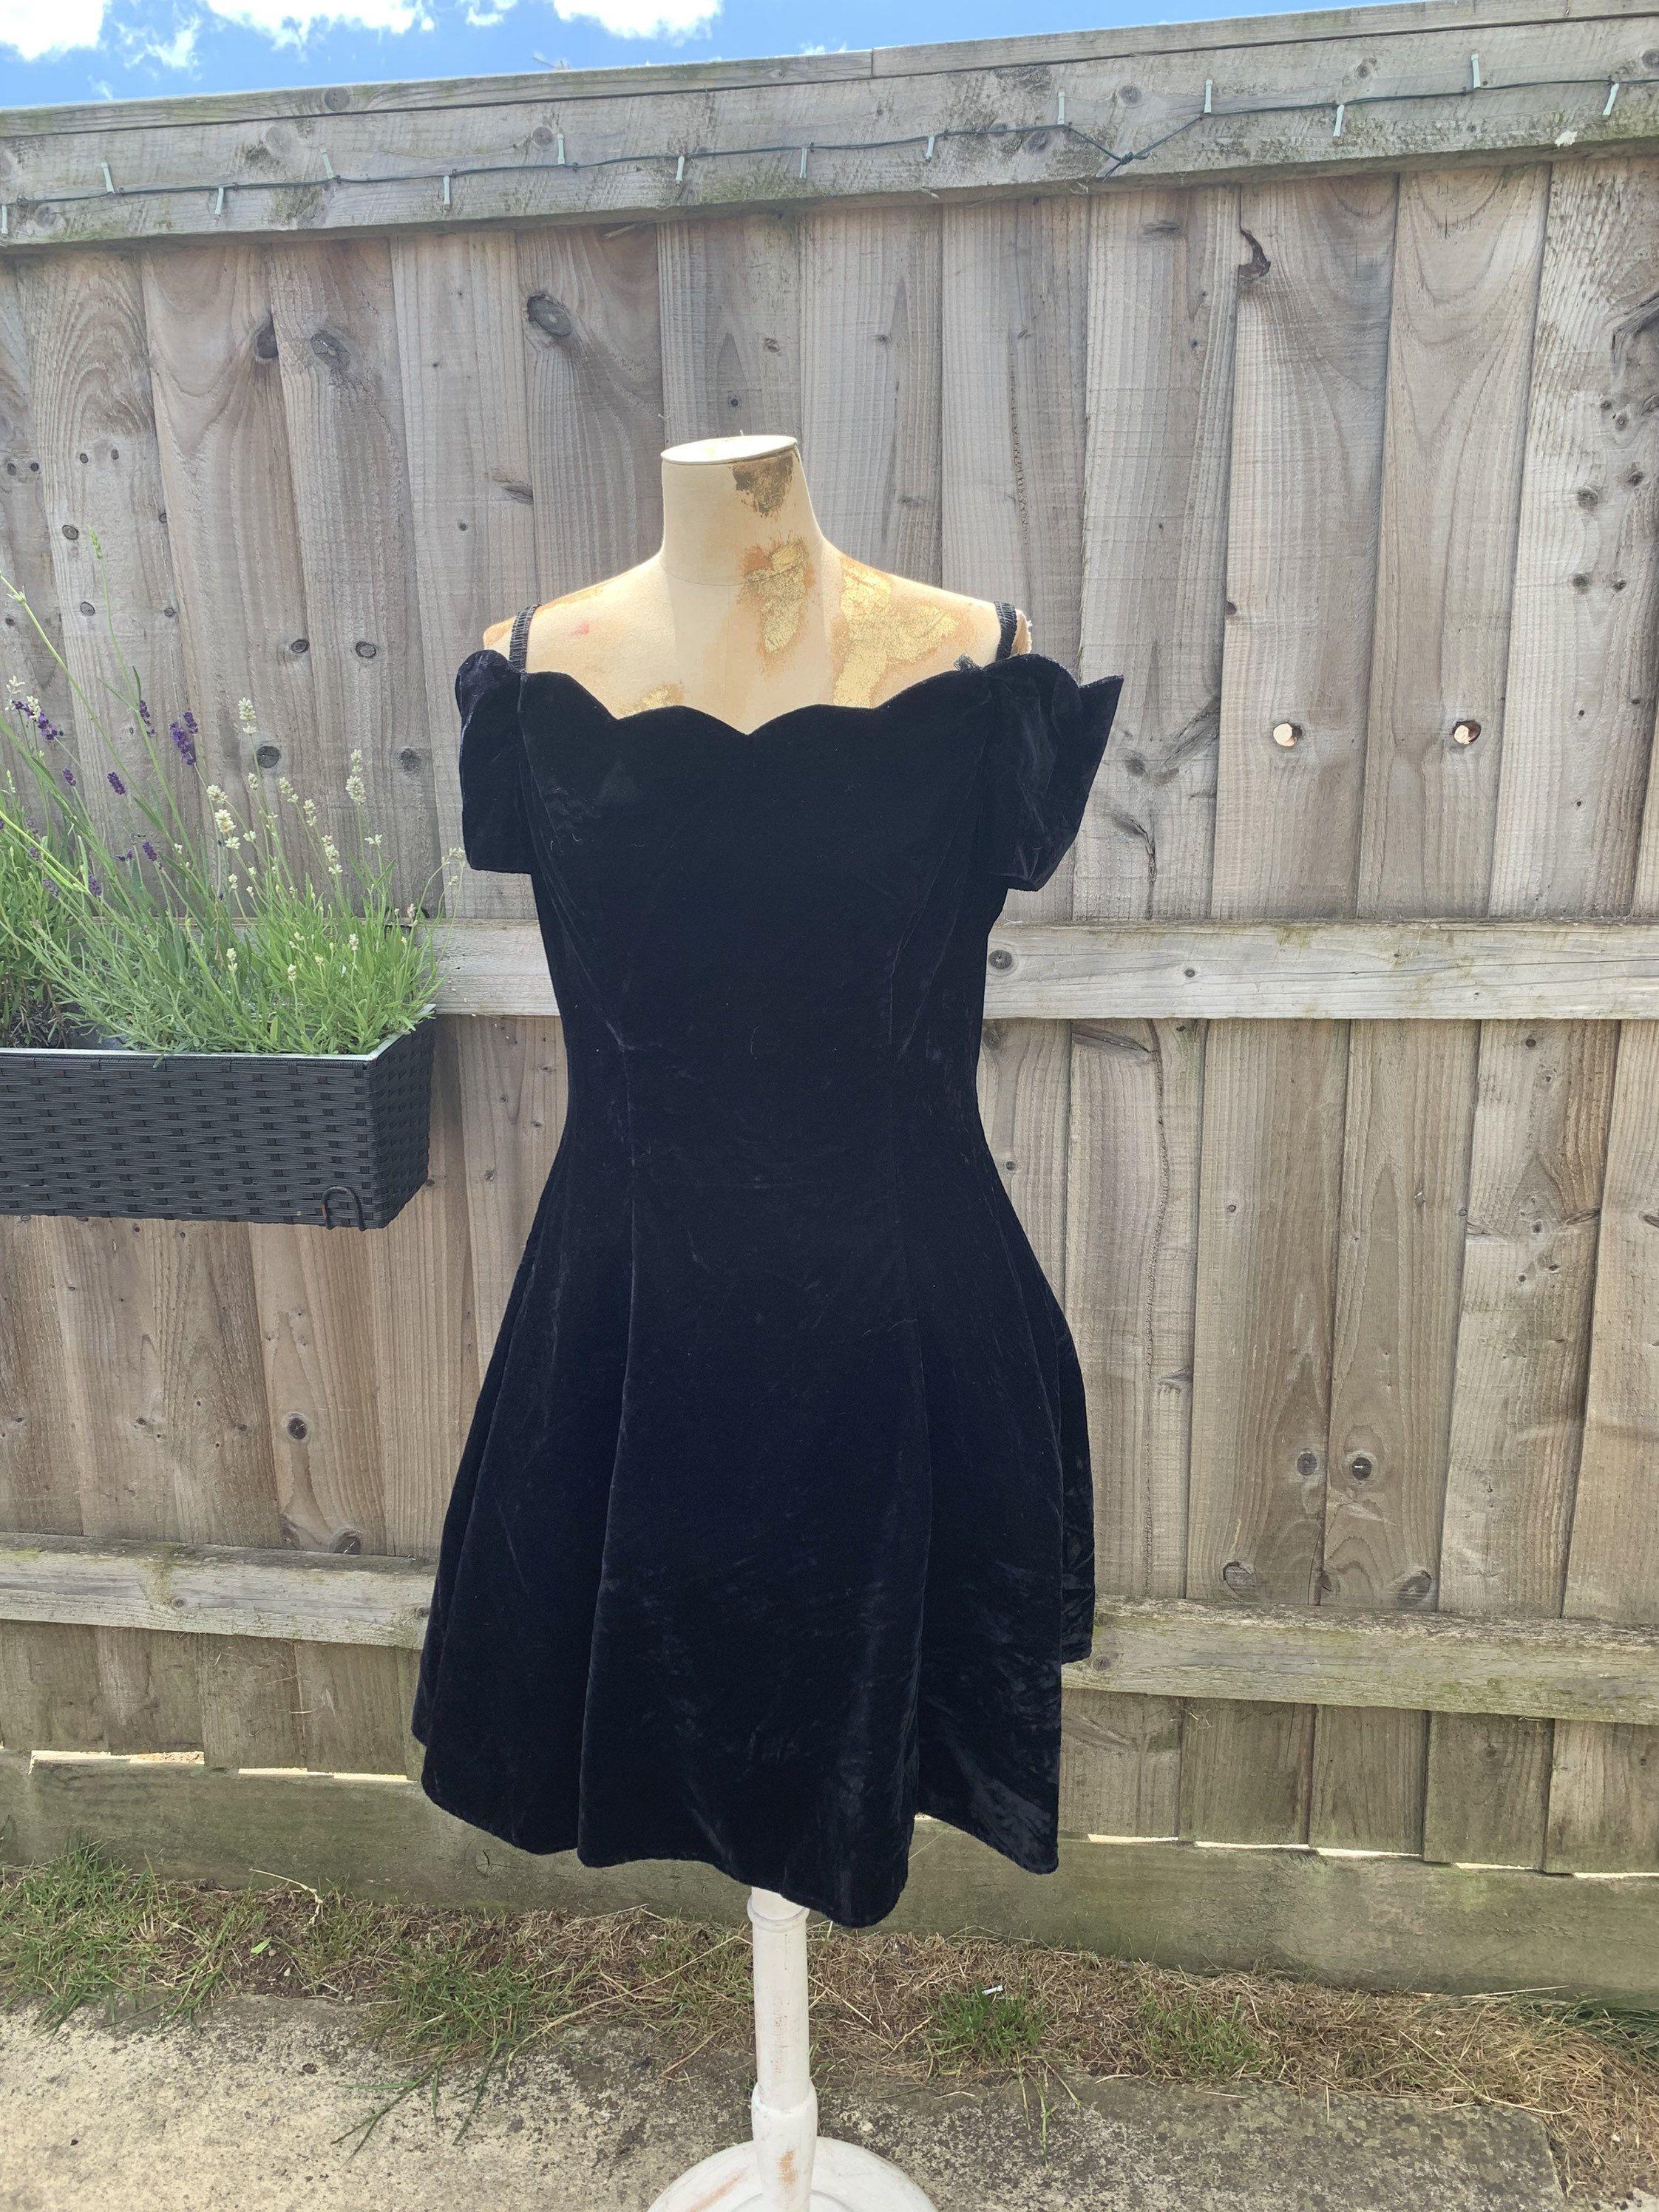 80s Roberta Black Crushed Velvet Mini Cocktail Dress Vintage Etsy Mini Cocktail Dress Cocktail Dress Vintage Vintage Dresses [ 2992 x 2244 Pixel ]